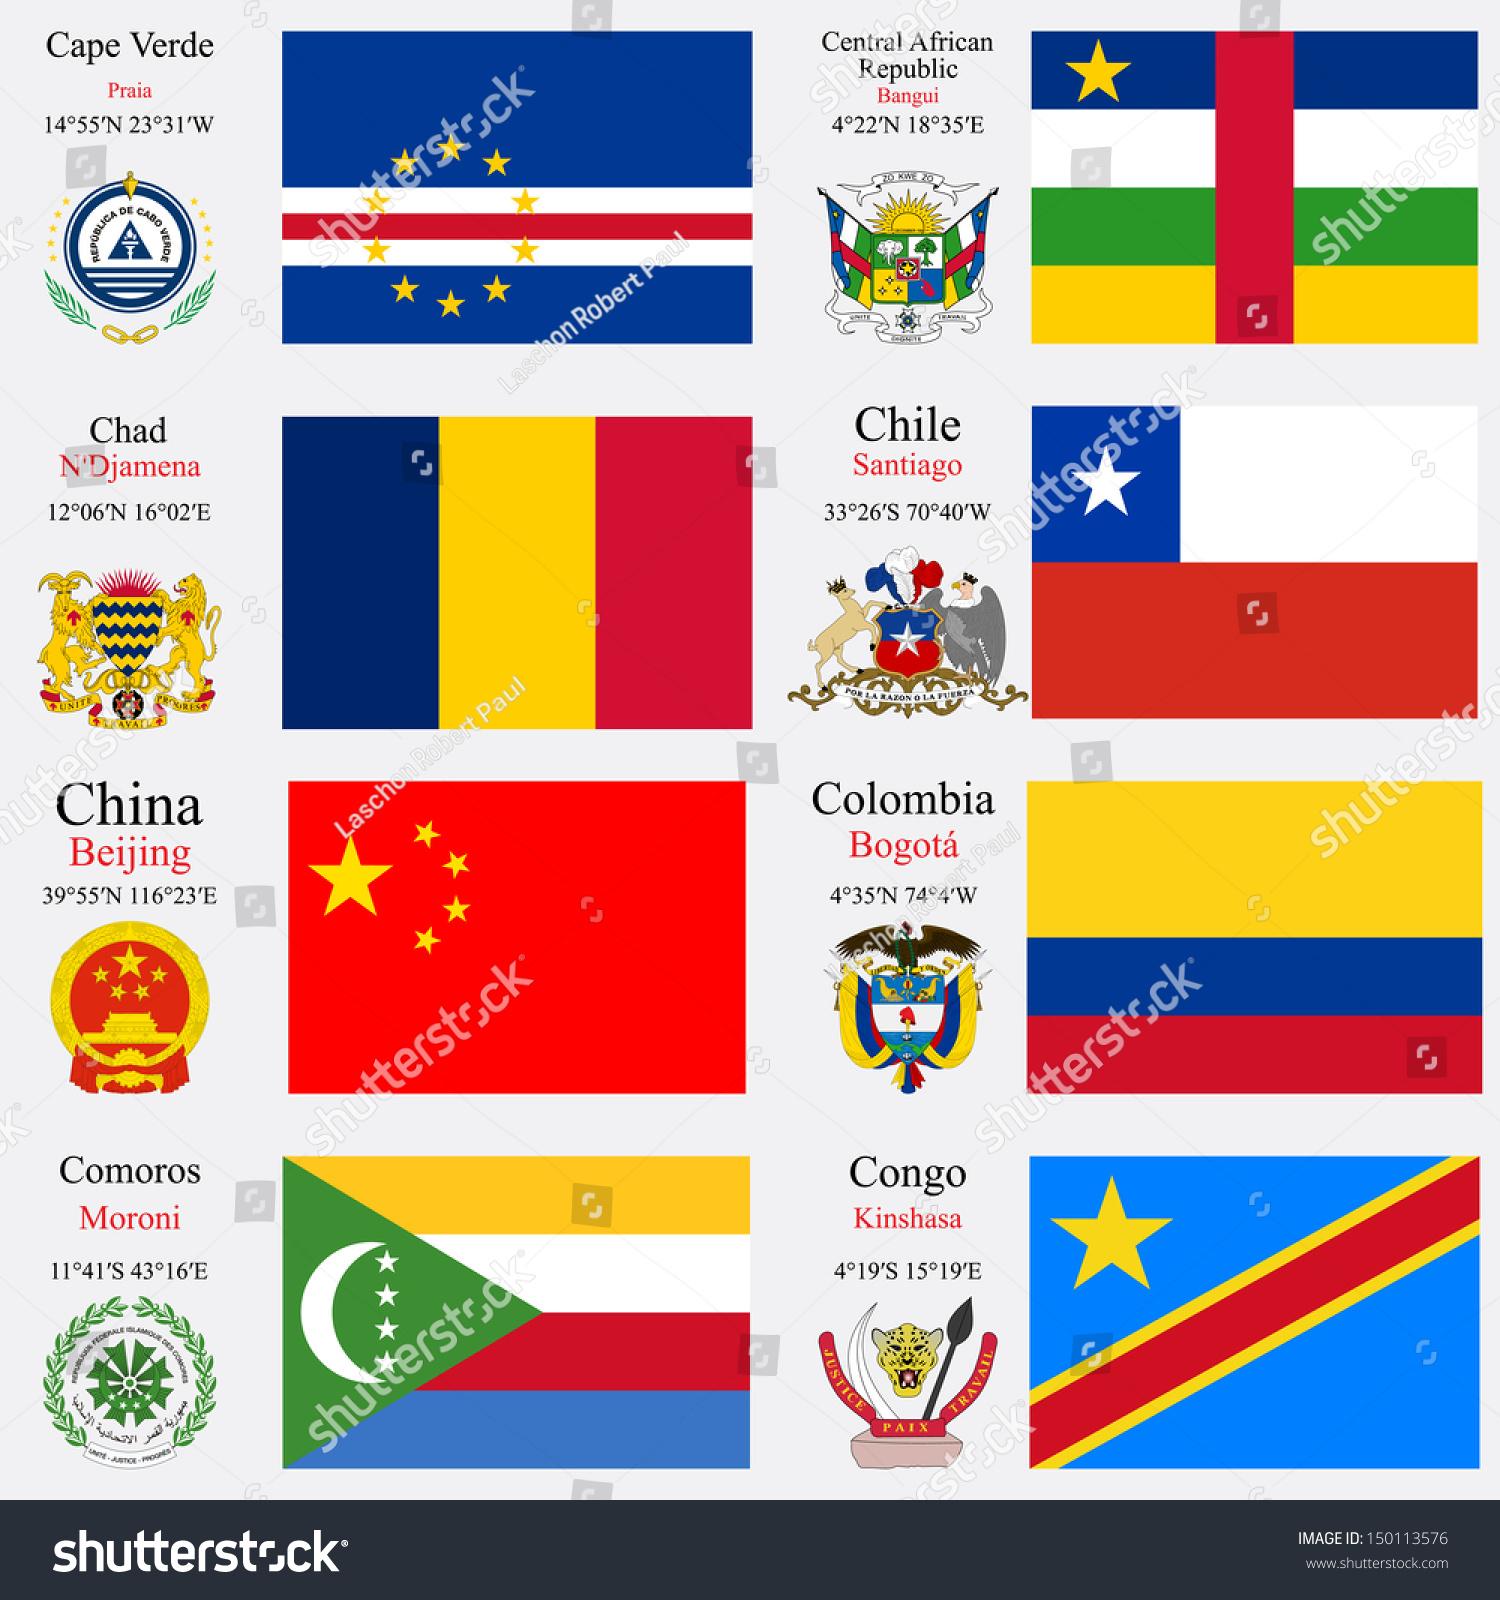 World Flags Cape Verde Central African Stock Illustration - Cape verde coordinates